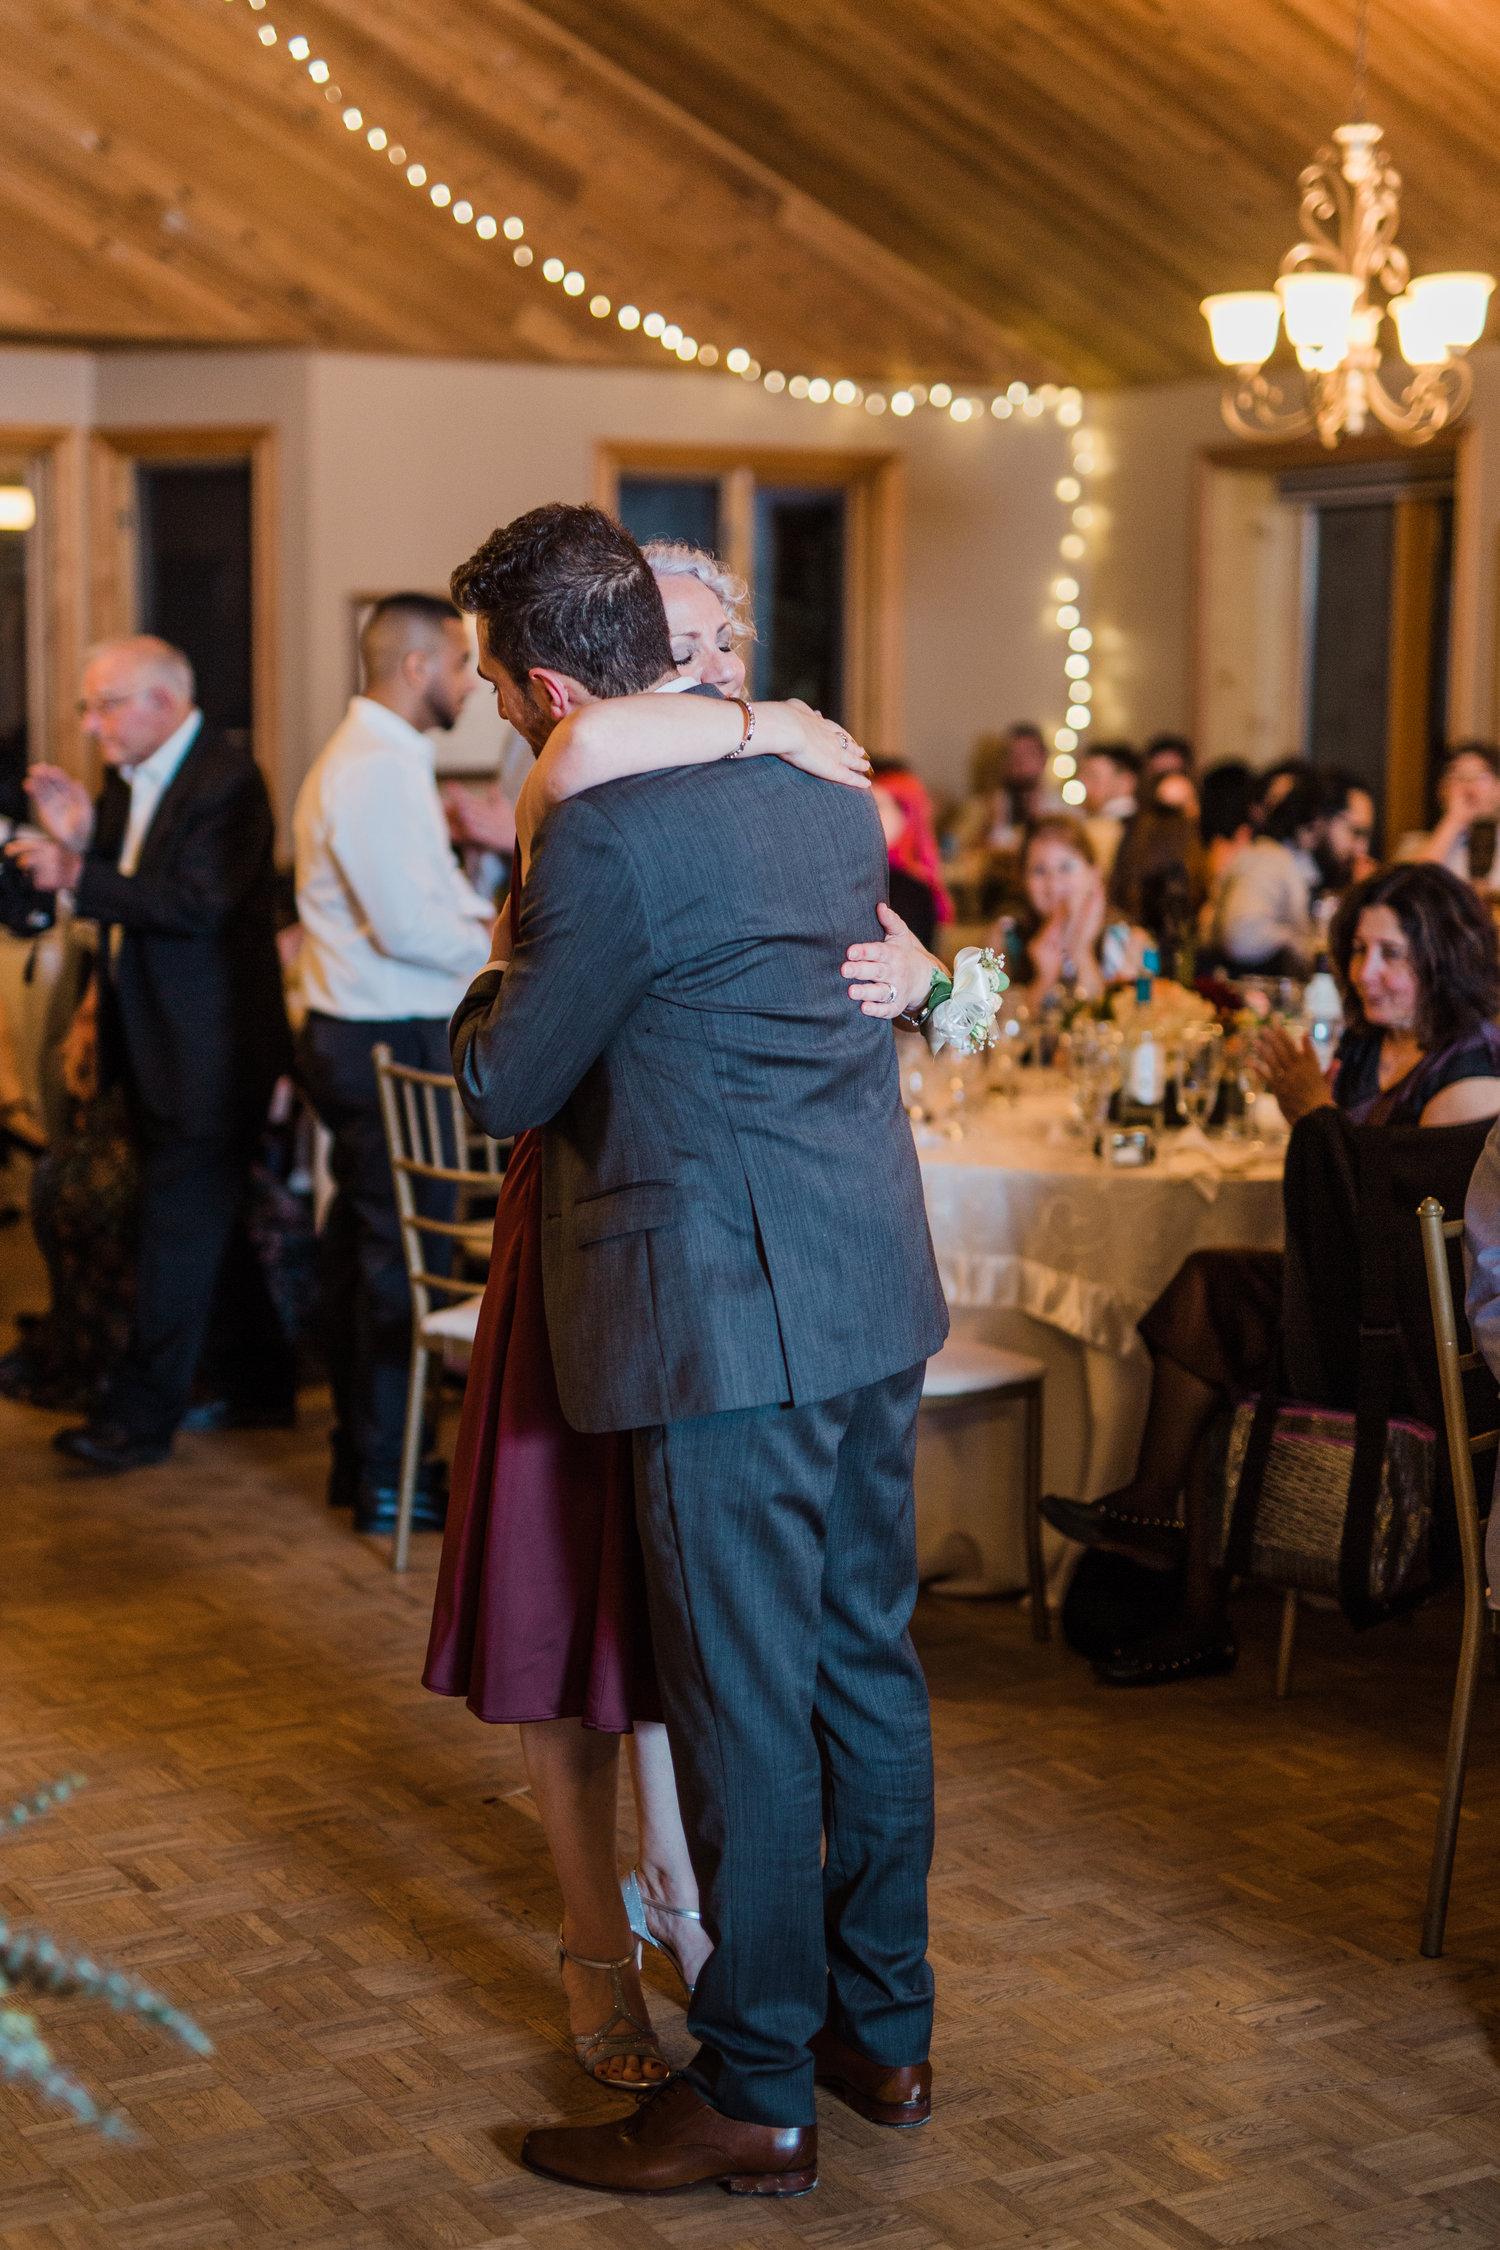 Amir-Golbazi-Danielle-Giroux-Photography_Toronto-Wedding_Cedarwood_Rachel-Paul_710.jpg